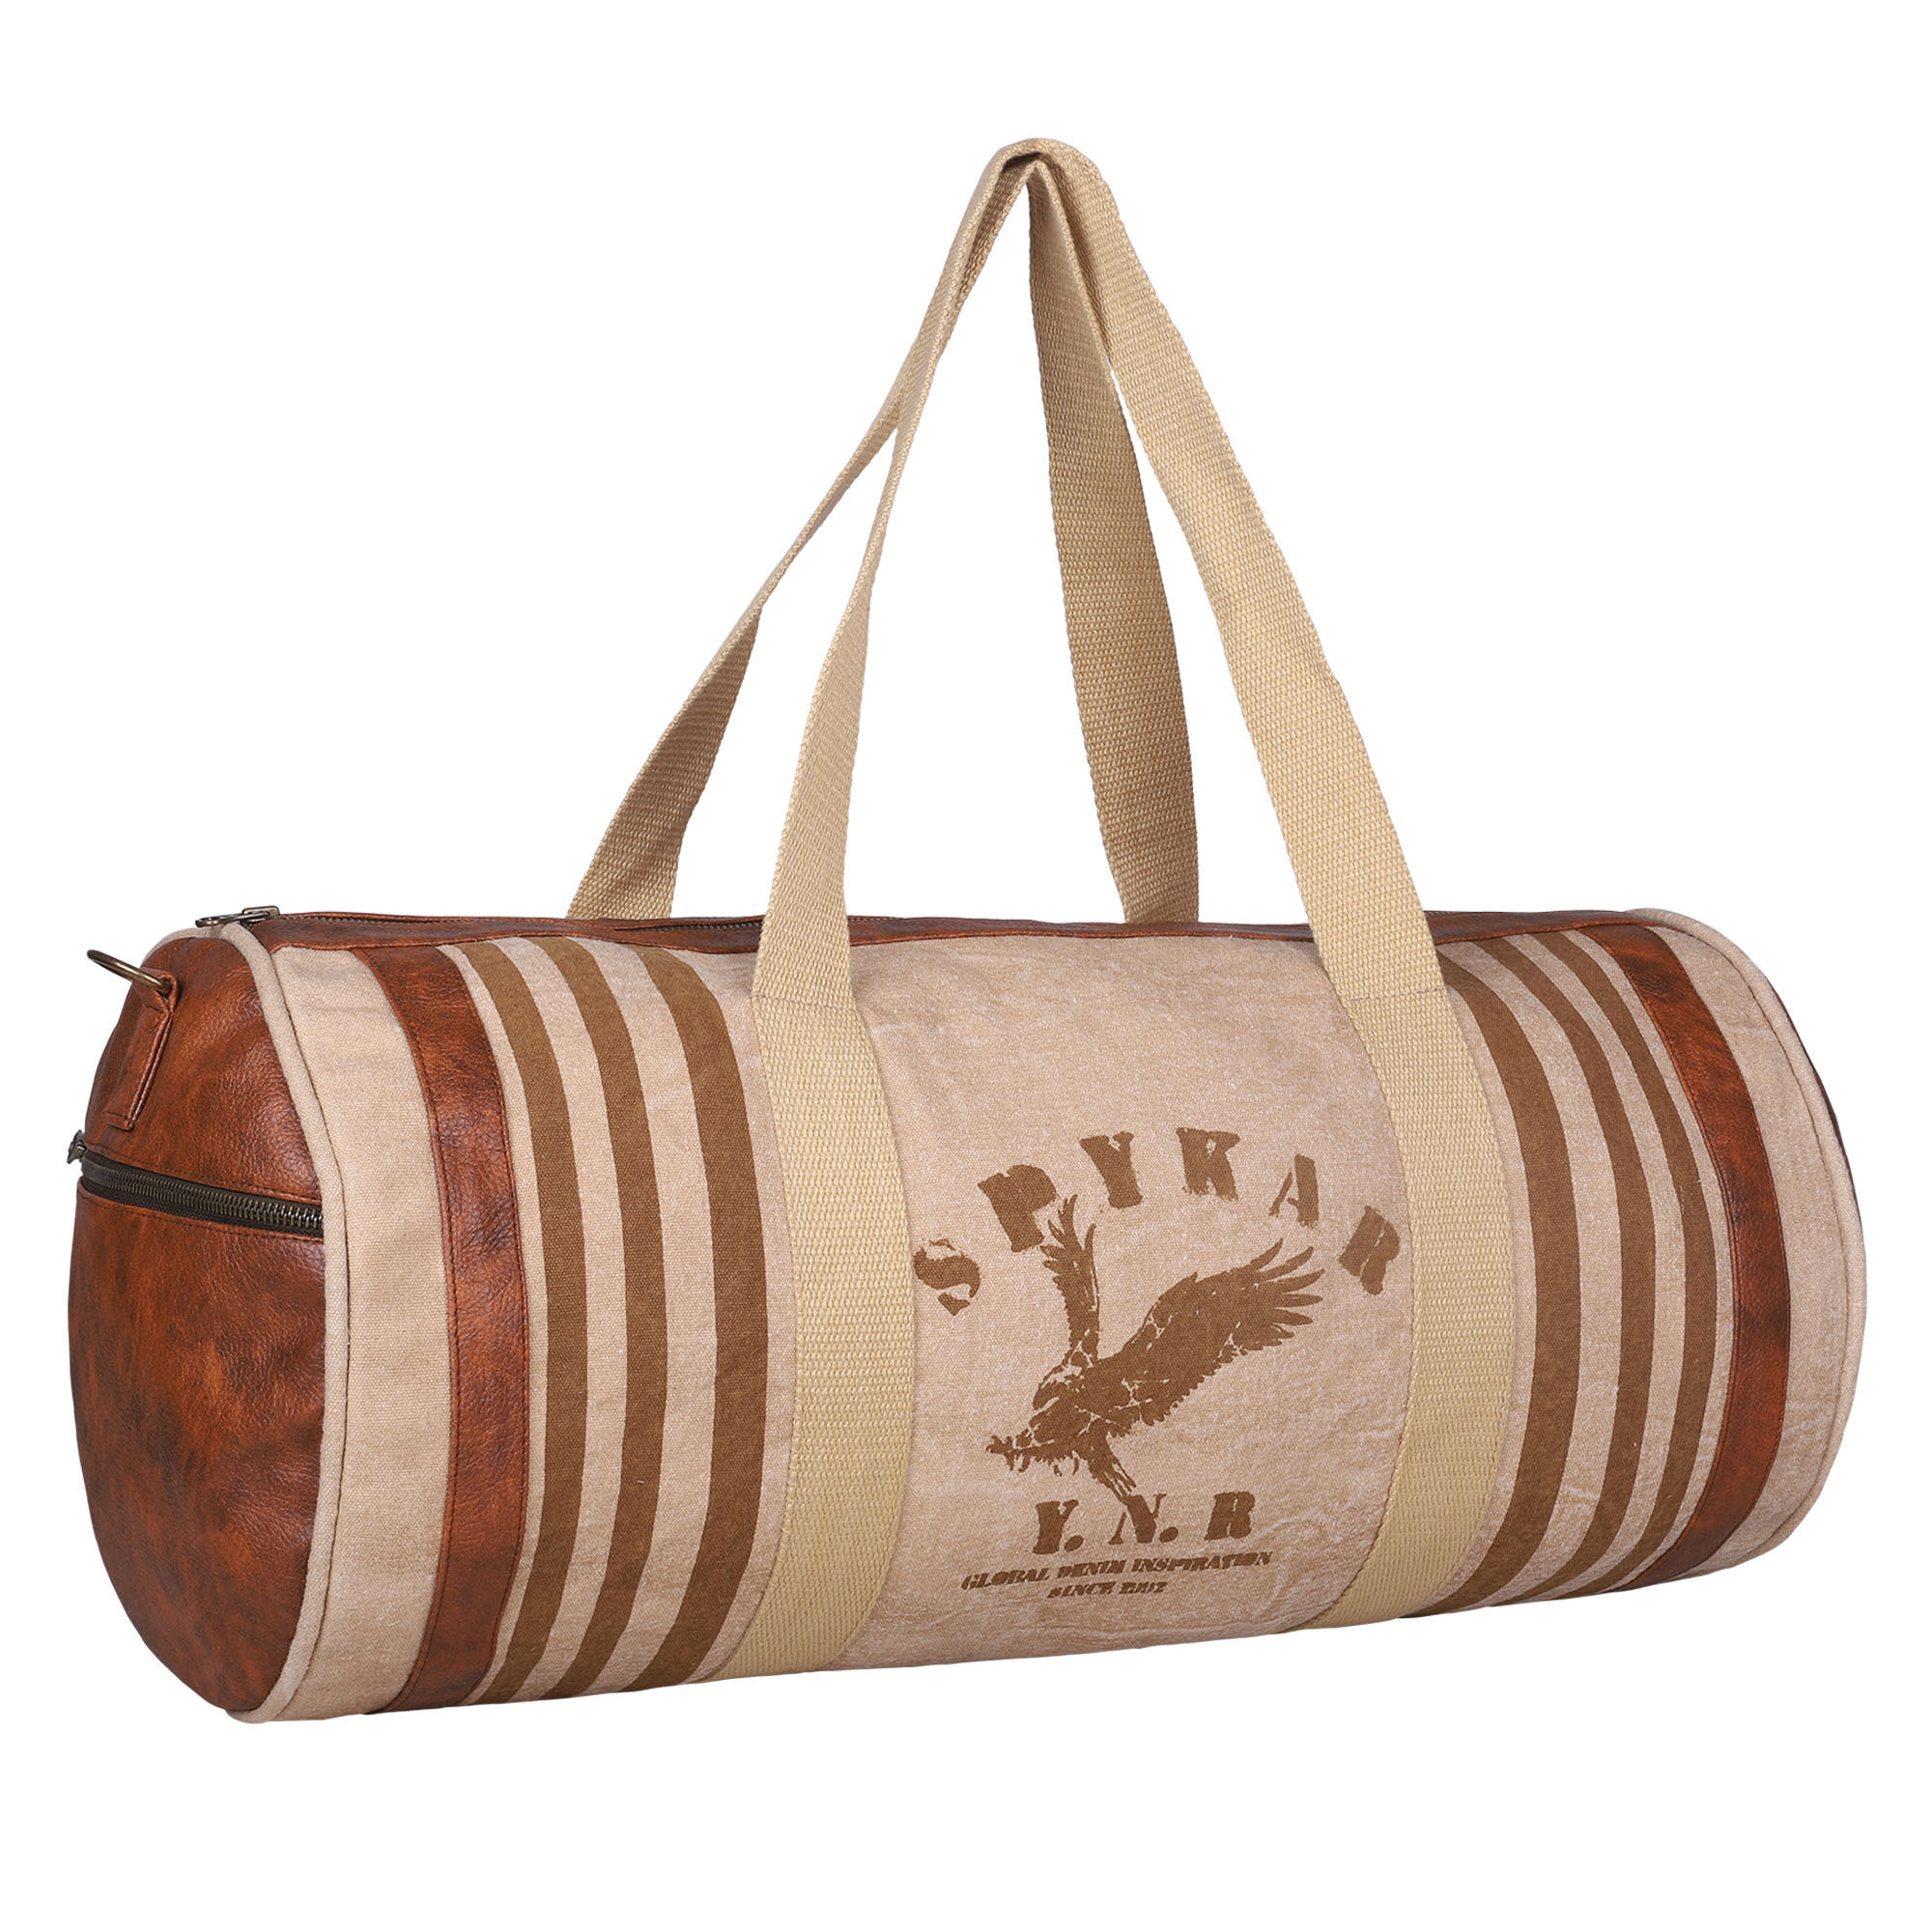 Spykar Beige Canvas Duffle Bag